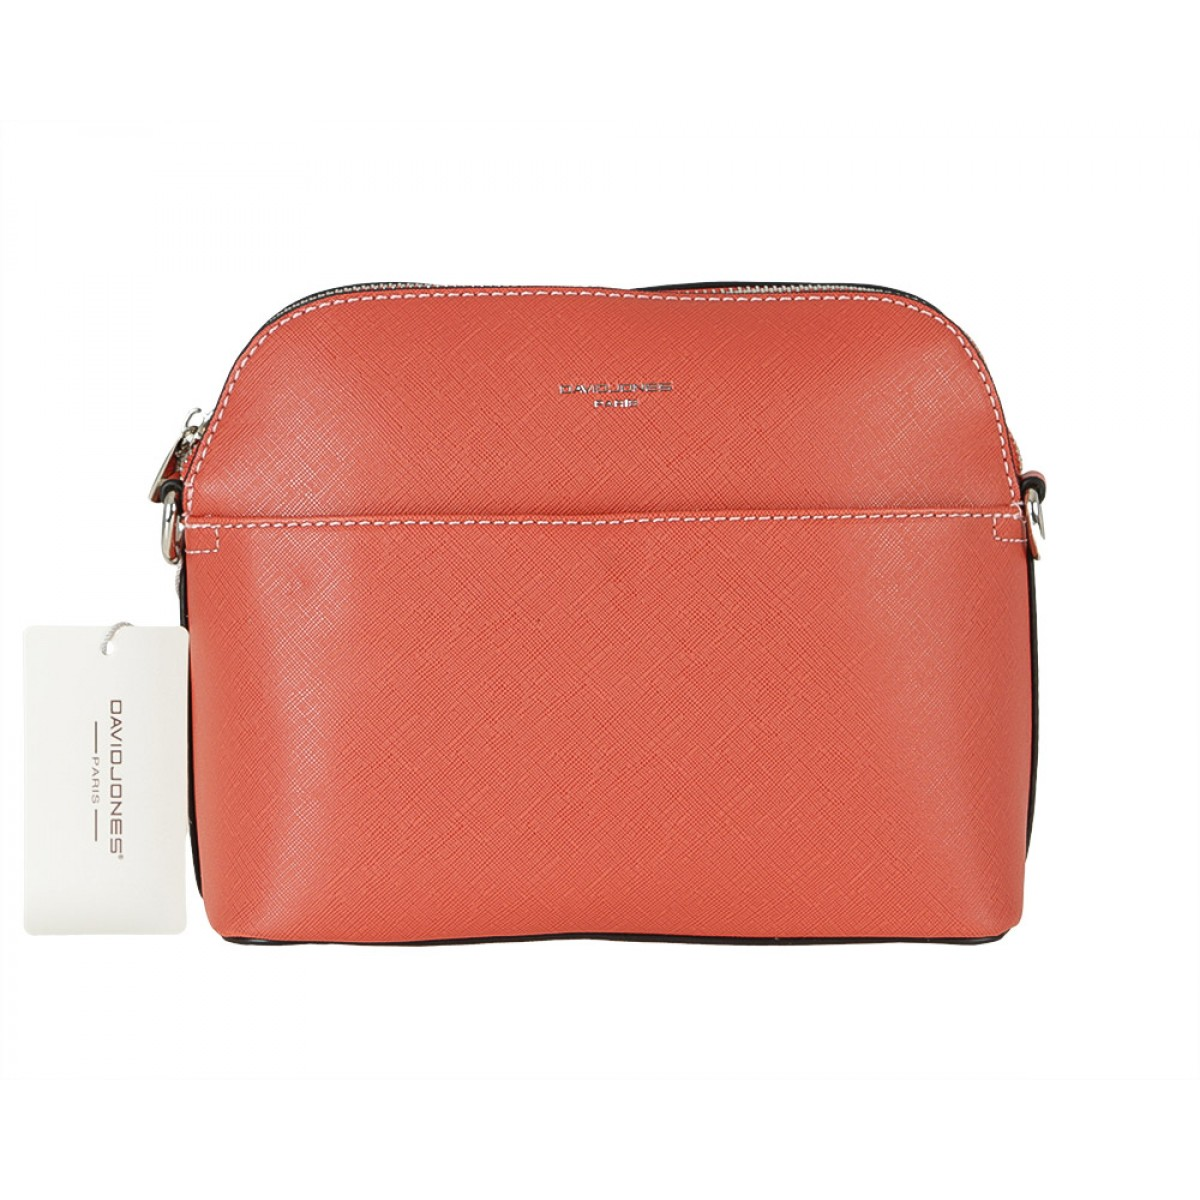 Жіноча сумка David Jones 6224-1 BRICK RED